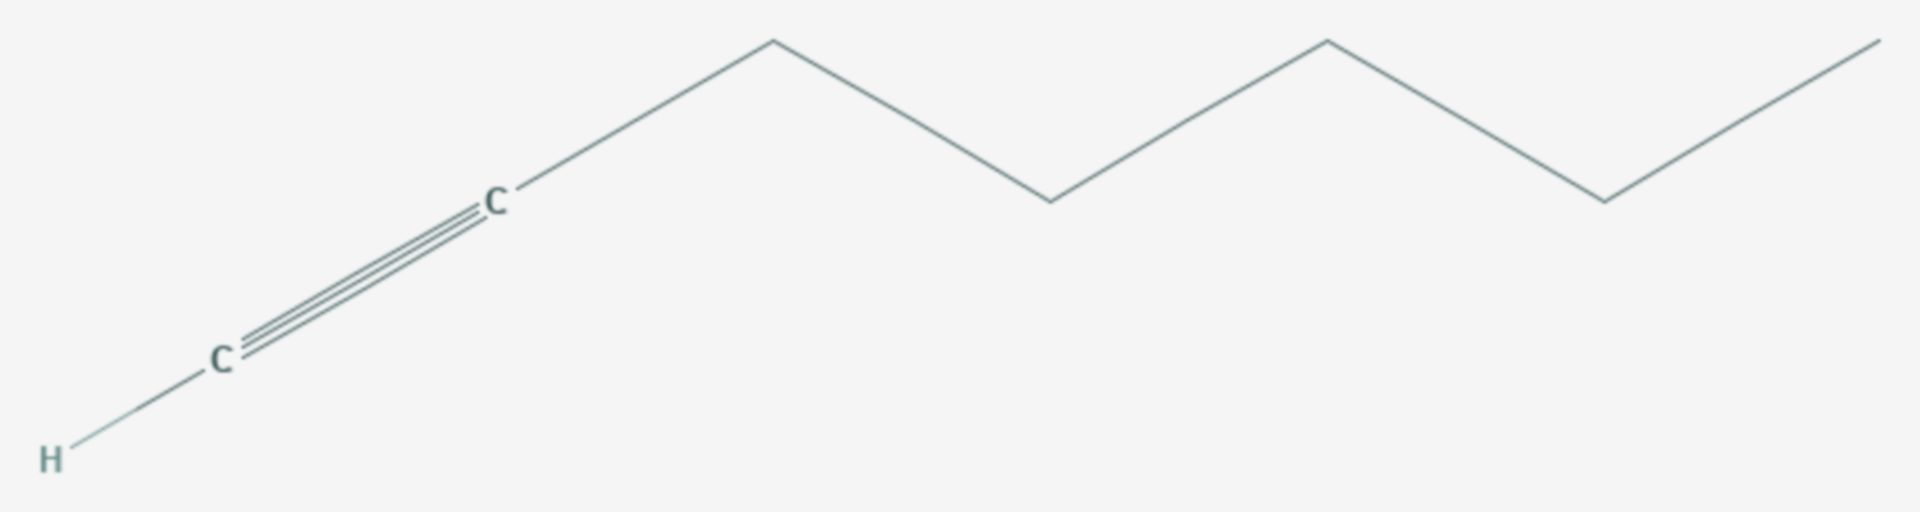 1-Heptin (Strukturformel)